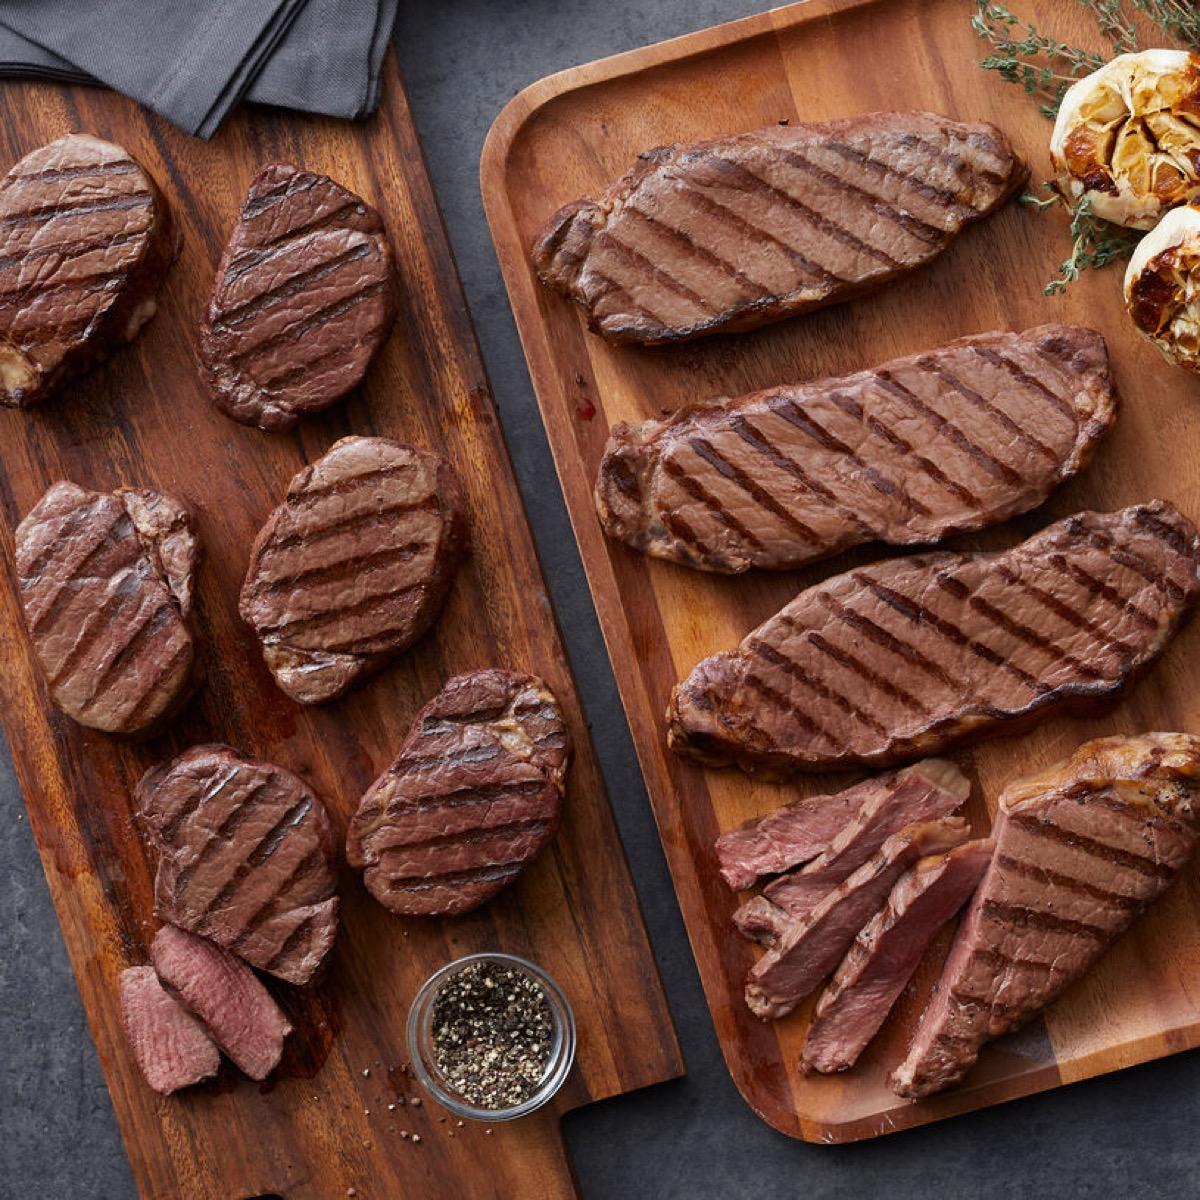 gourmet steaks on cutting boards